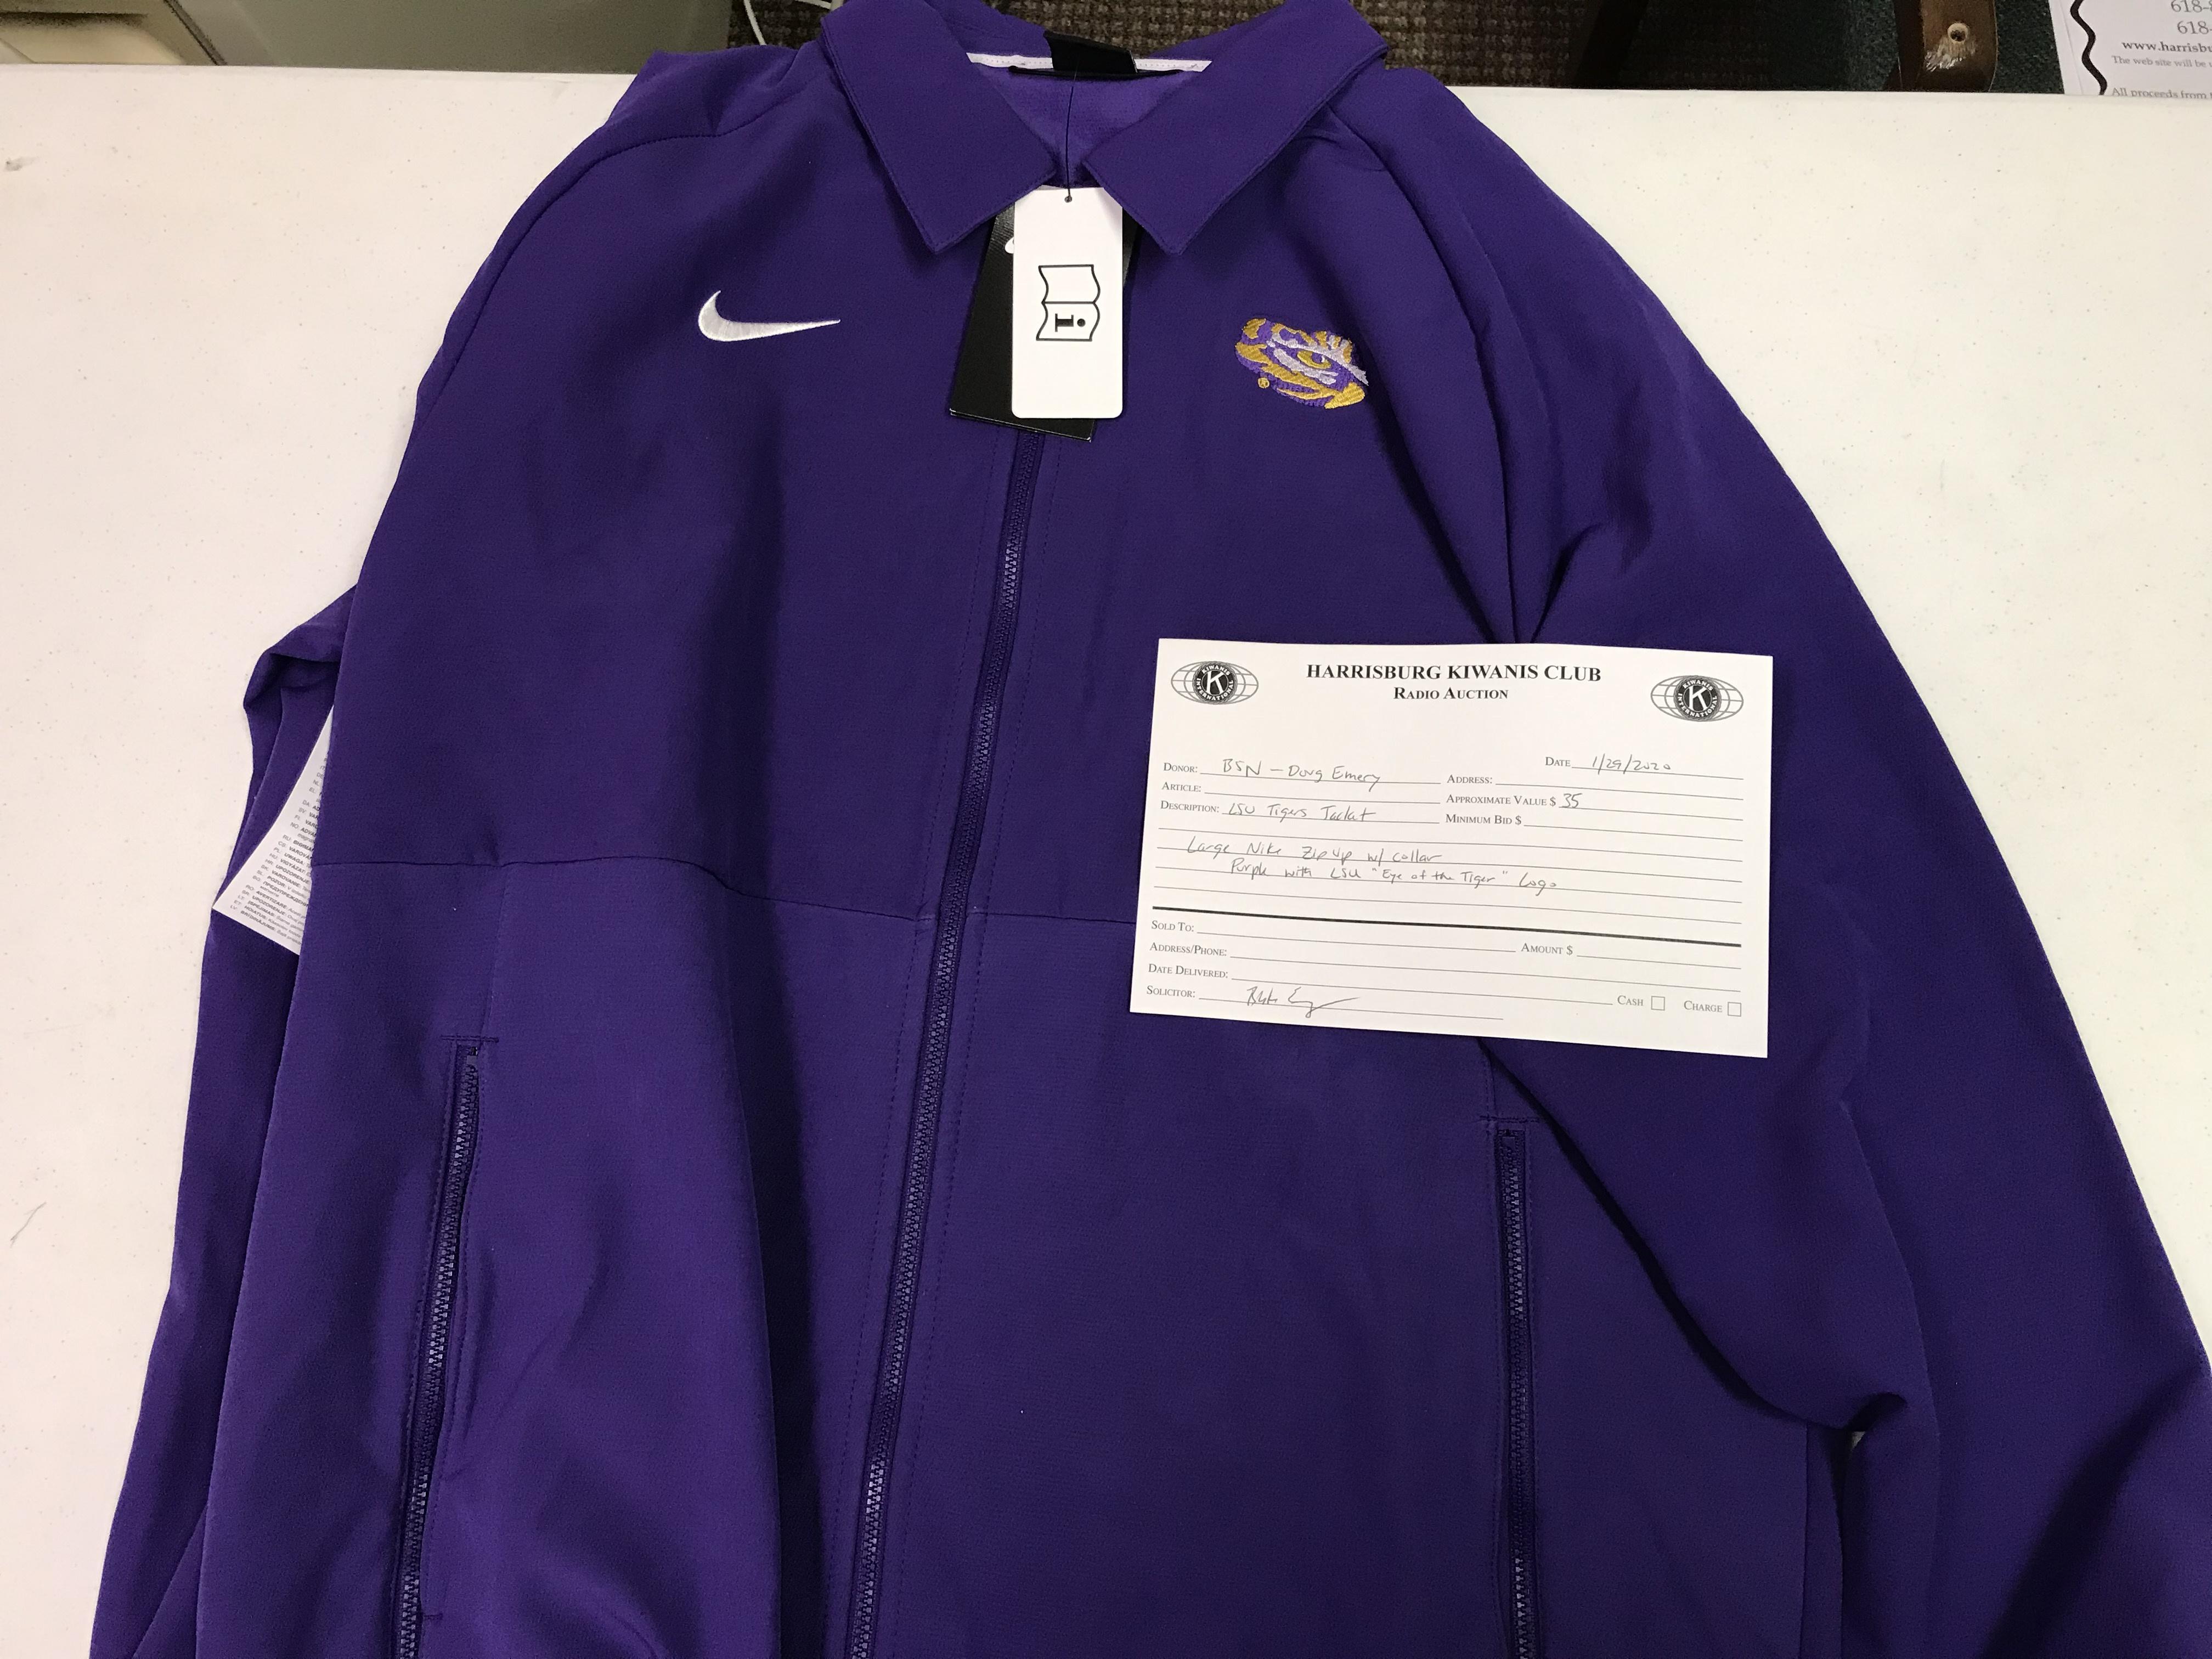 Item 116 - BSN - Doug Emery Nike Large LSU Tigers Zip Up with Collar